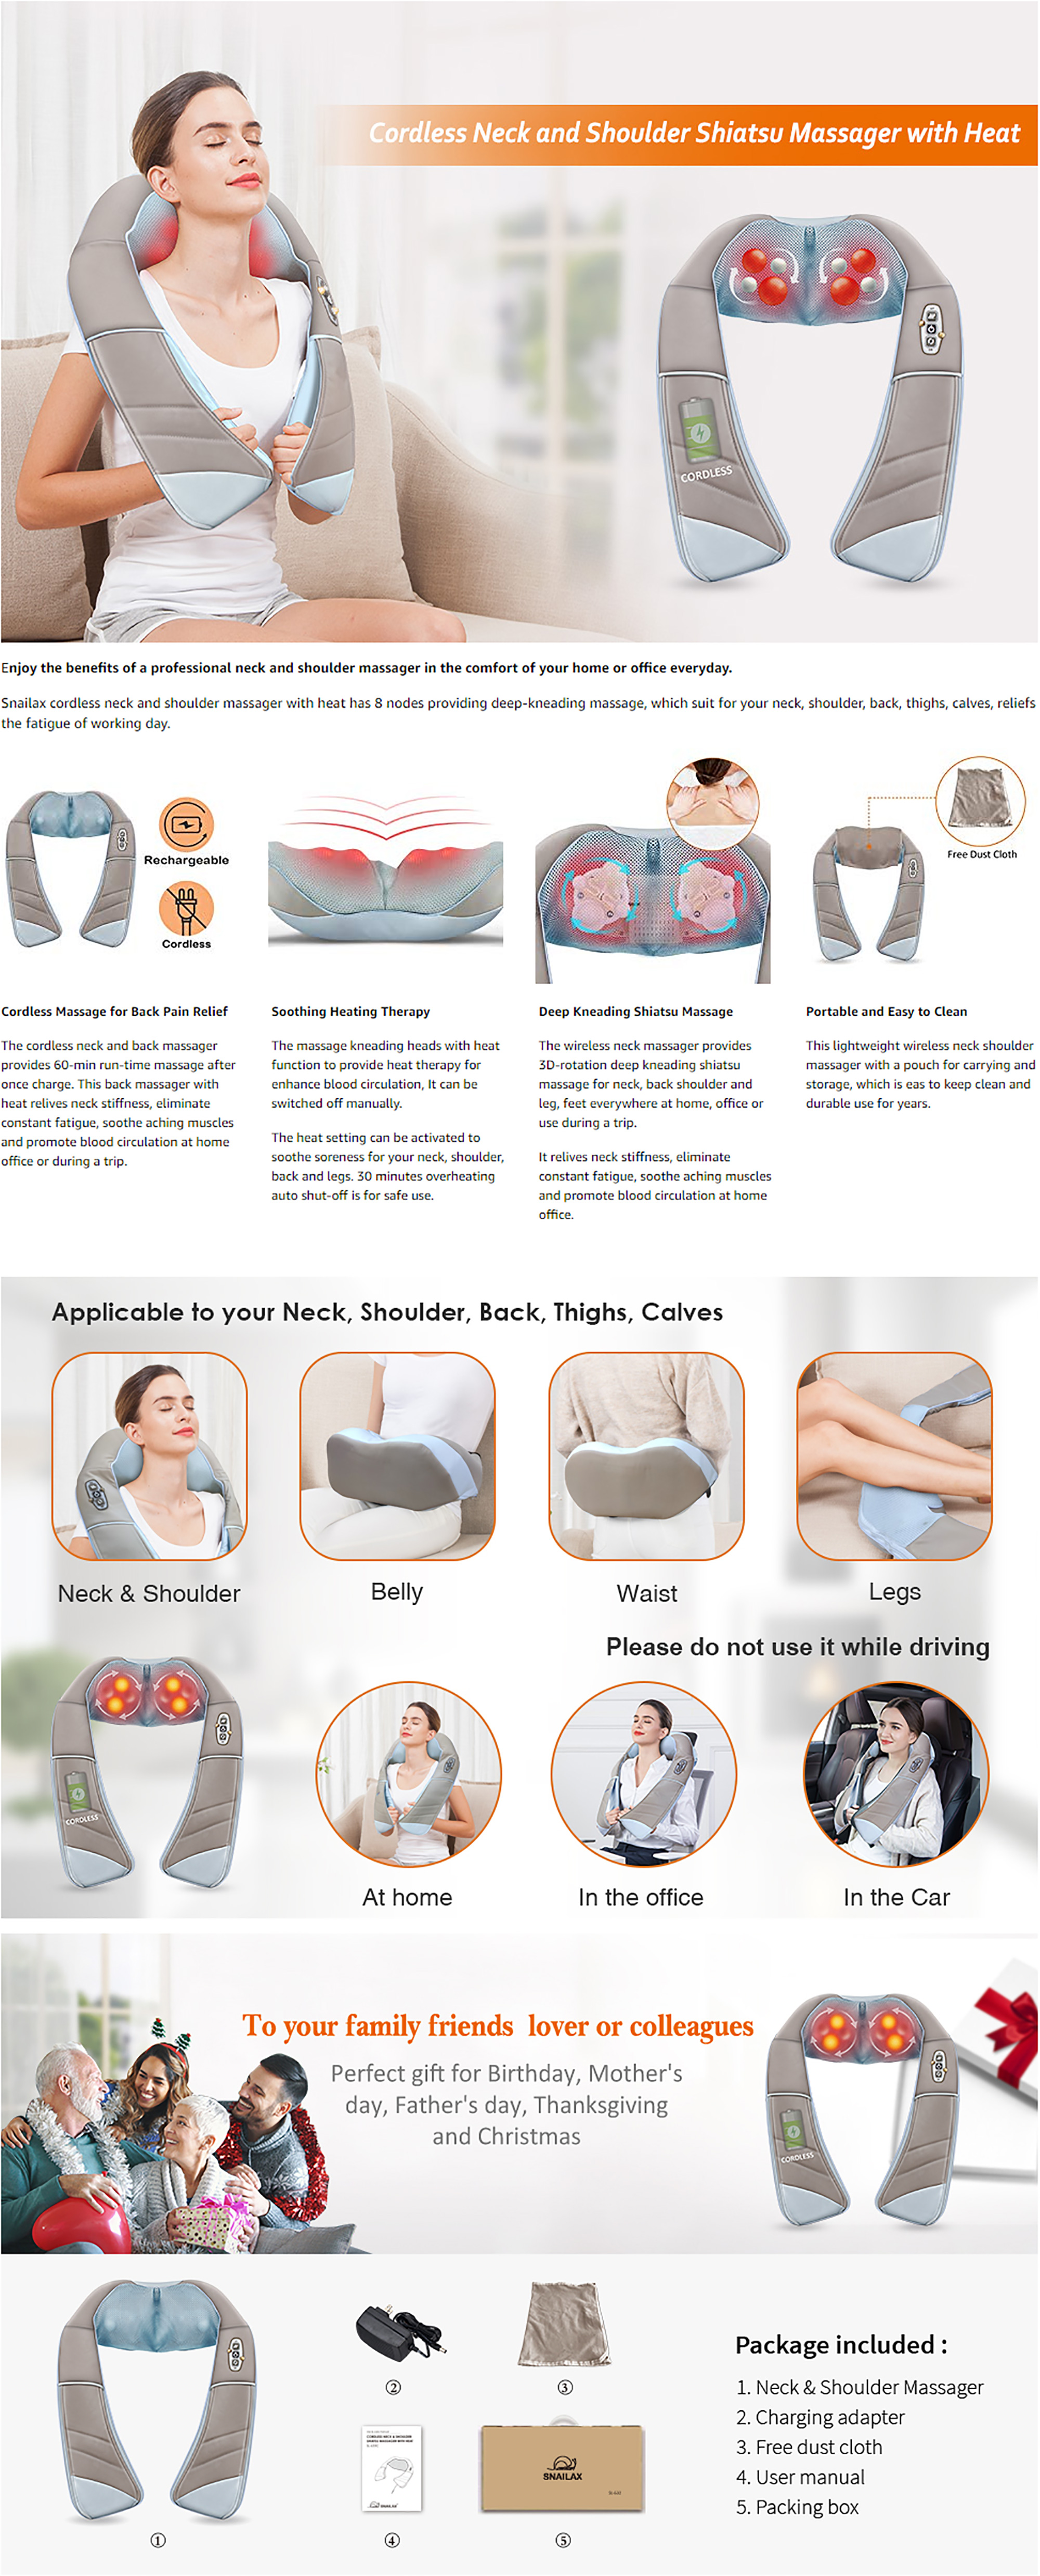 Snailax Wireless Shiatsu Neck & Shoulder Cordless Massager Features